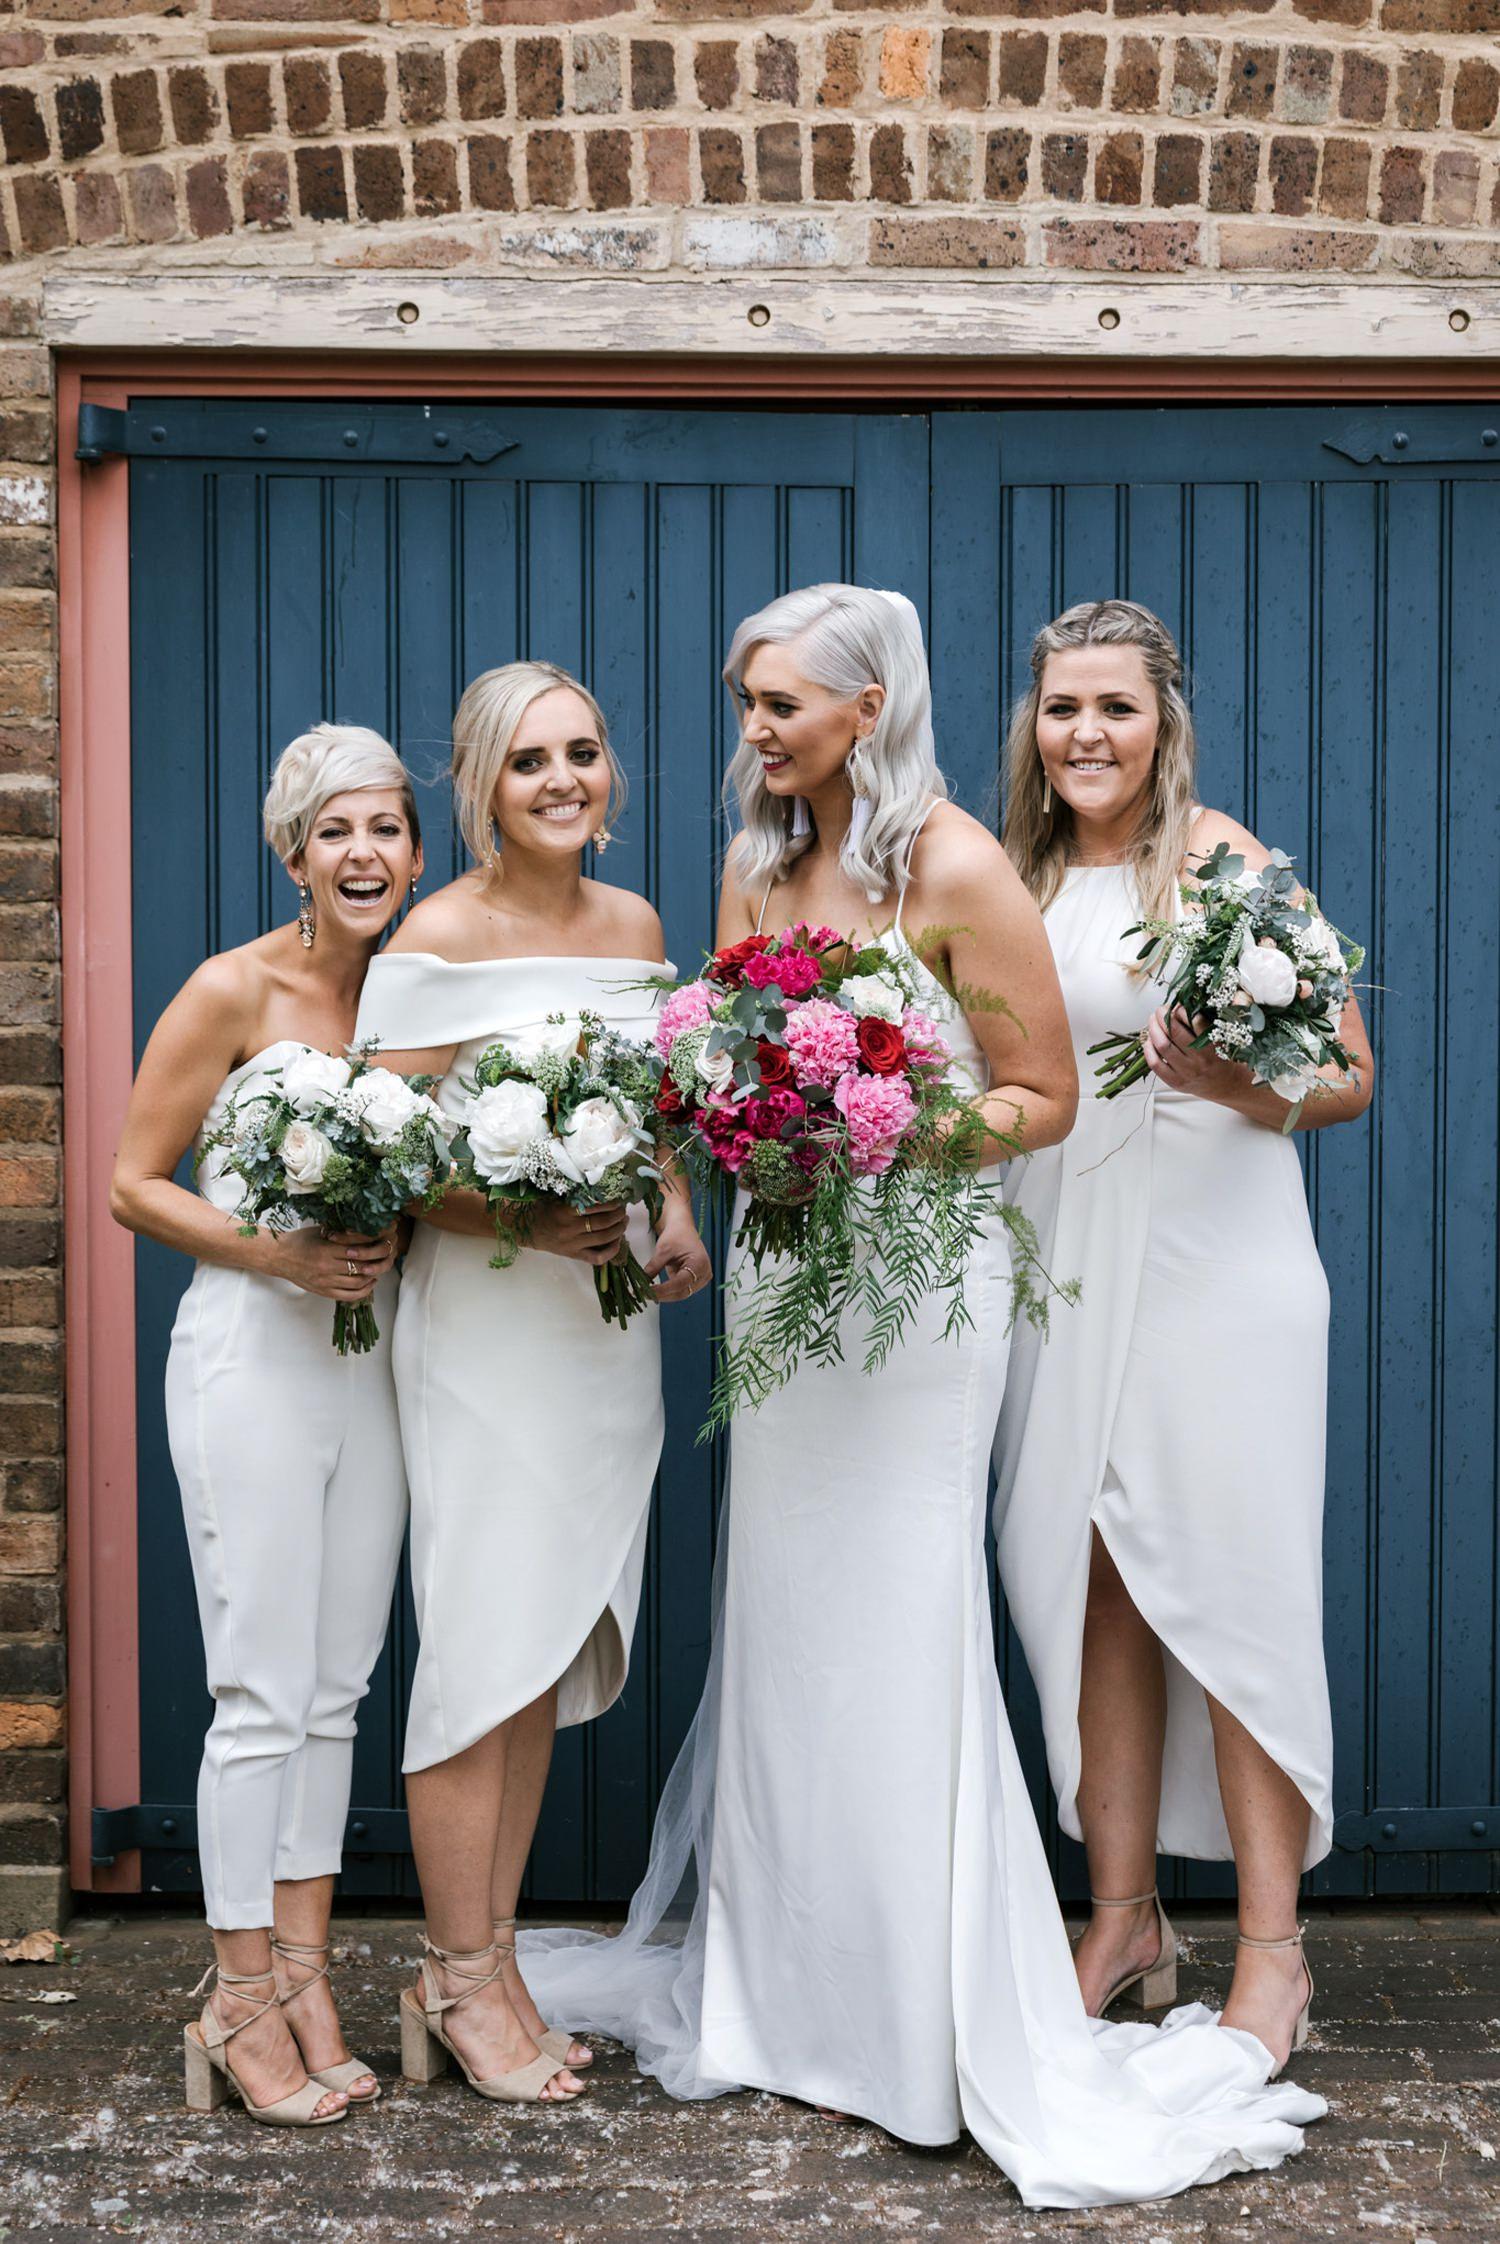 brea luke erin latimore photography athol gardens wedding blayney 31.jpg